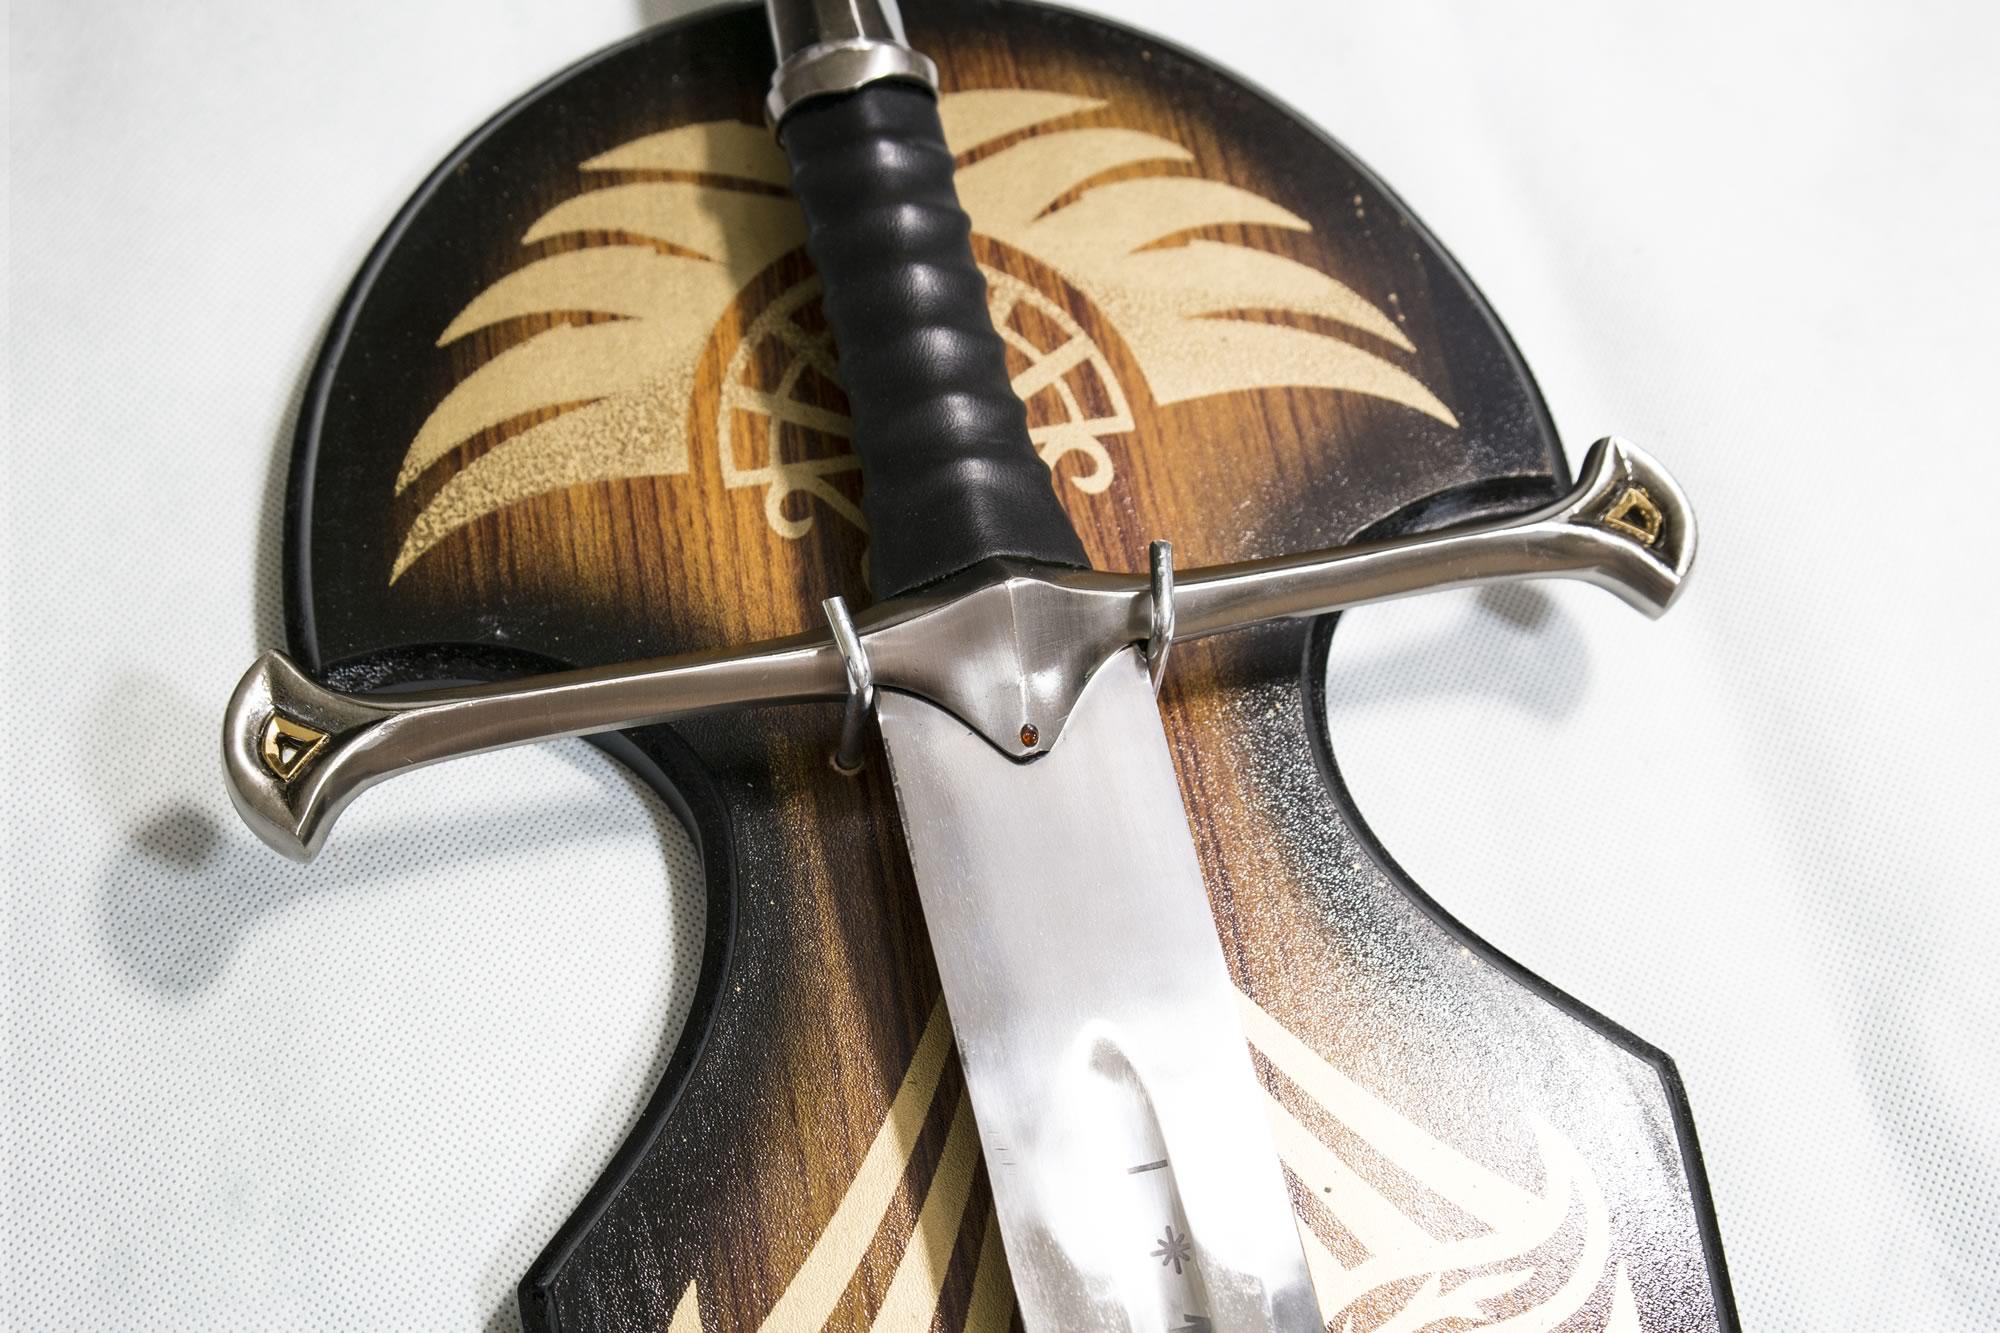 Anduril 163 49 50 Dragon Reborn